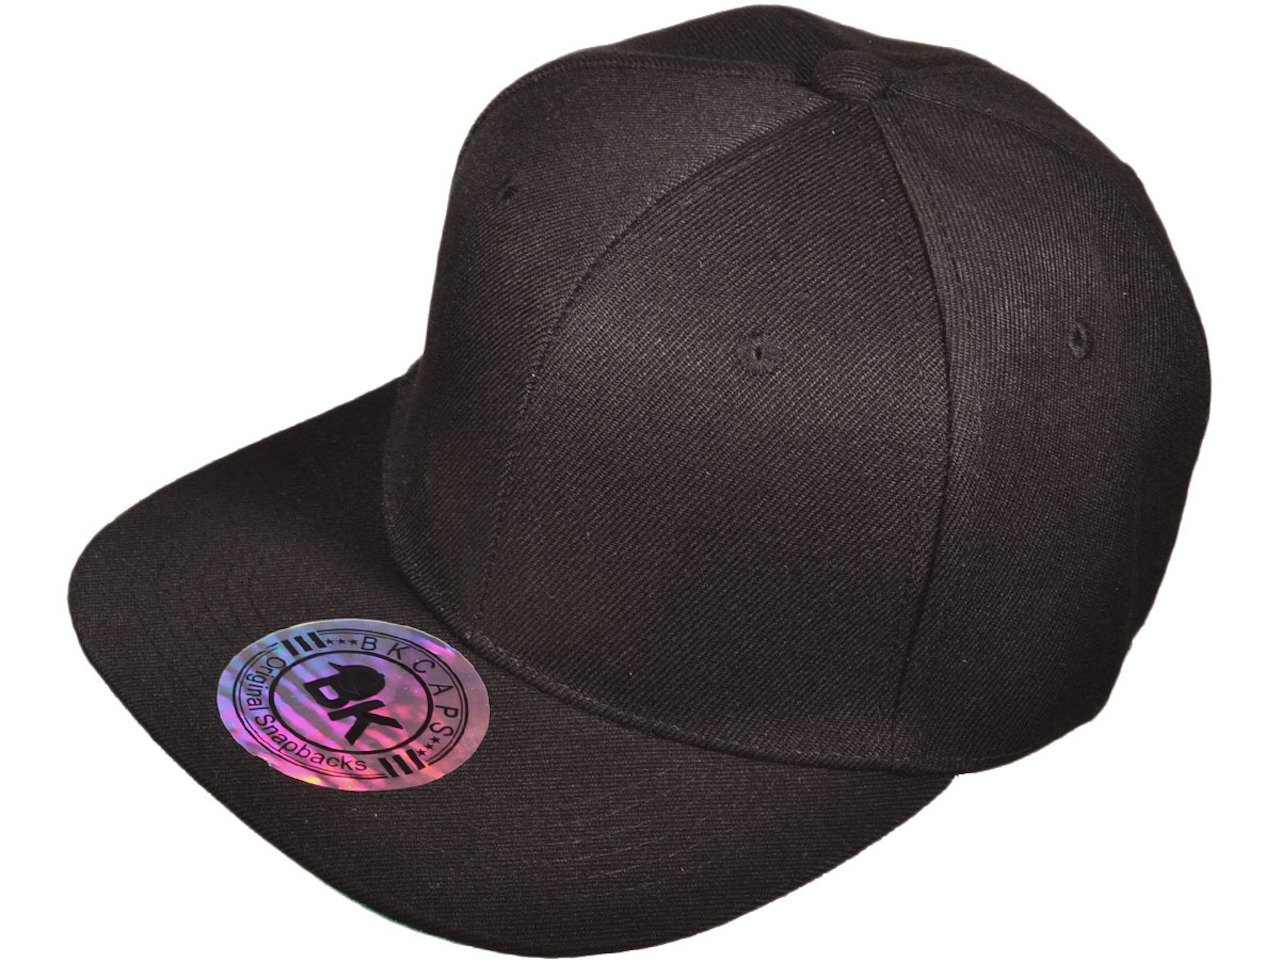 Amazon.com   New Blank Plain Black Snapback Hat Cap Flat Bill Adjustable  Green Underbill   Sports   Outdoors a3679a4bae2